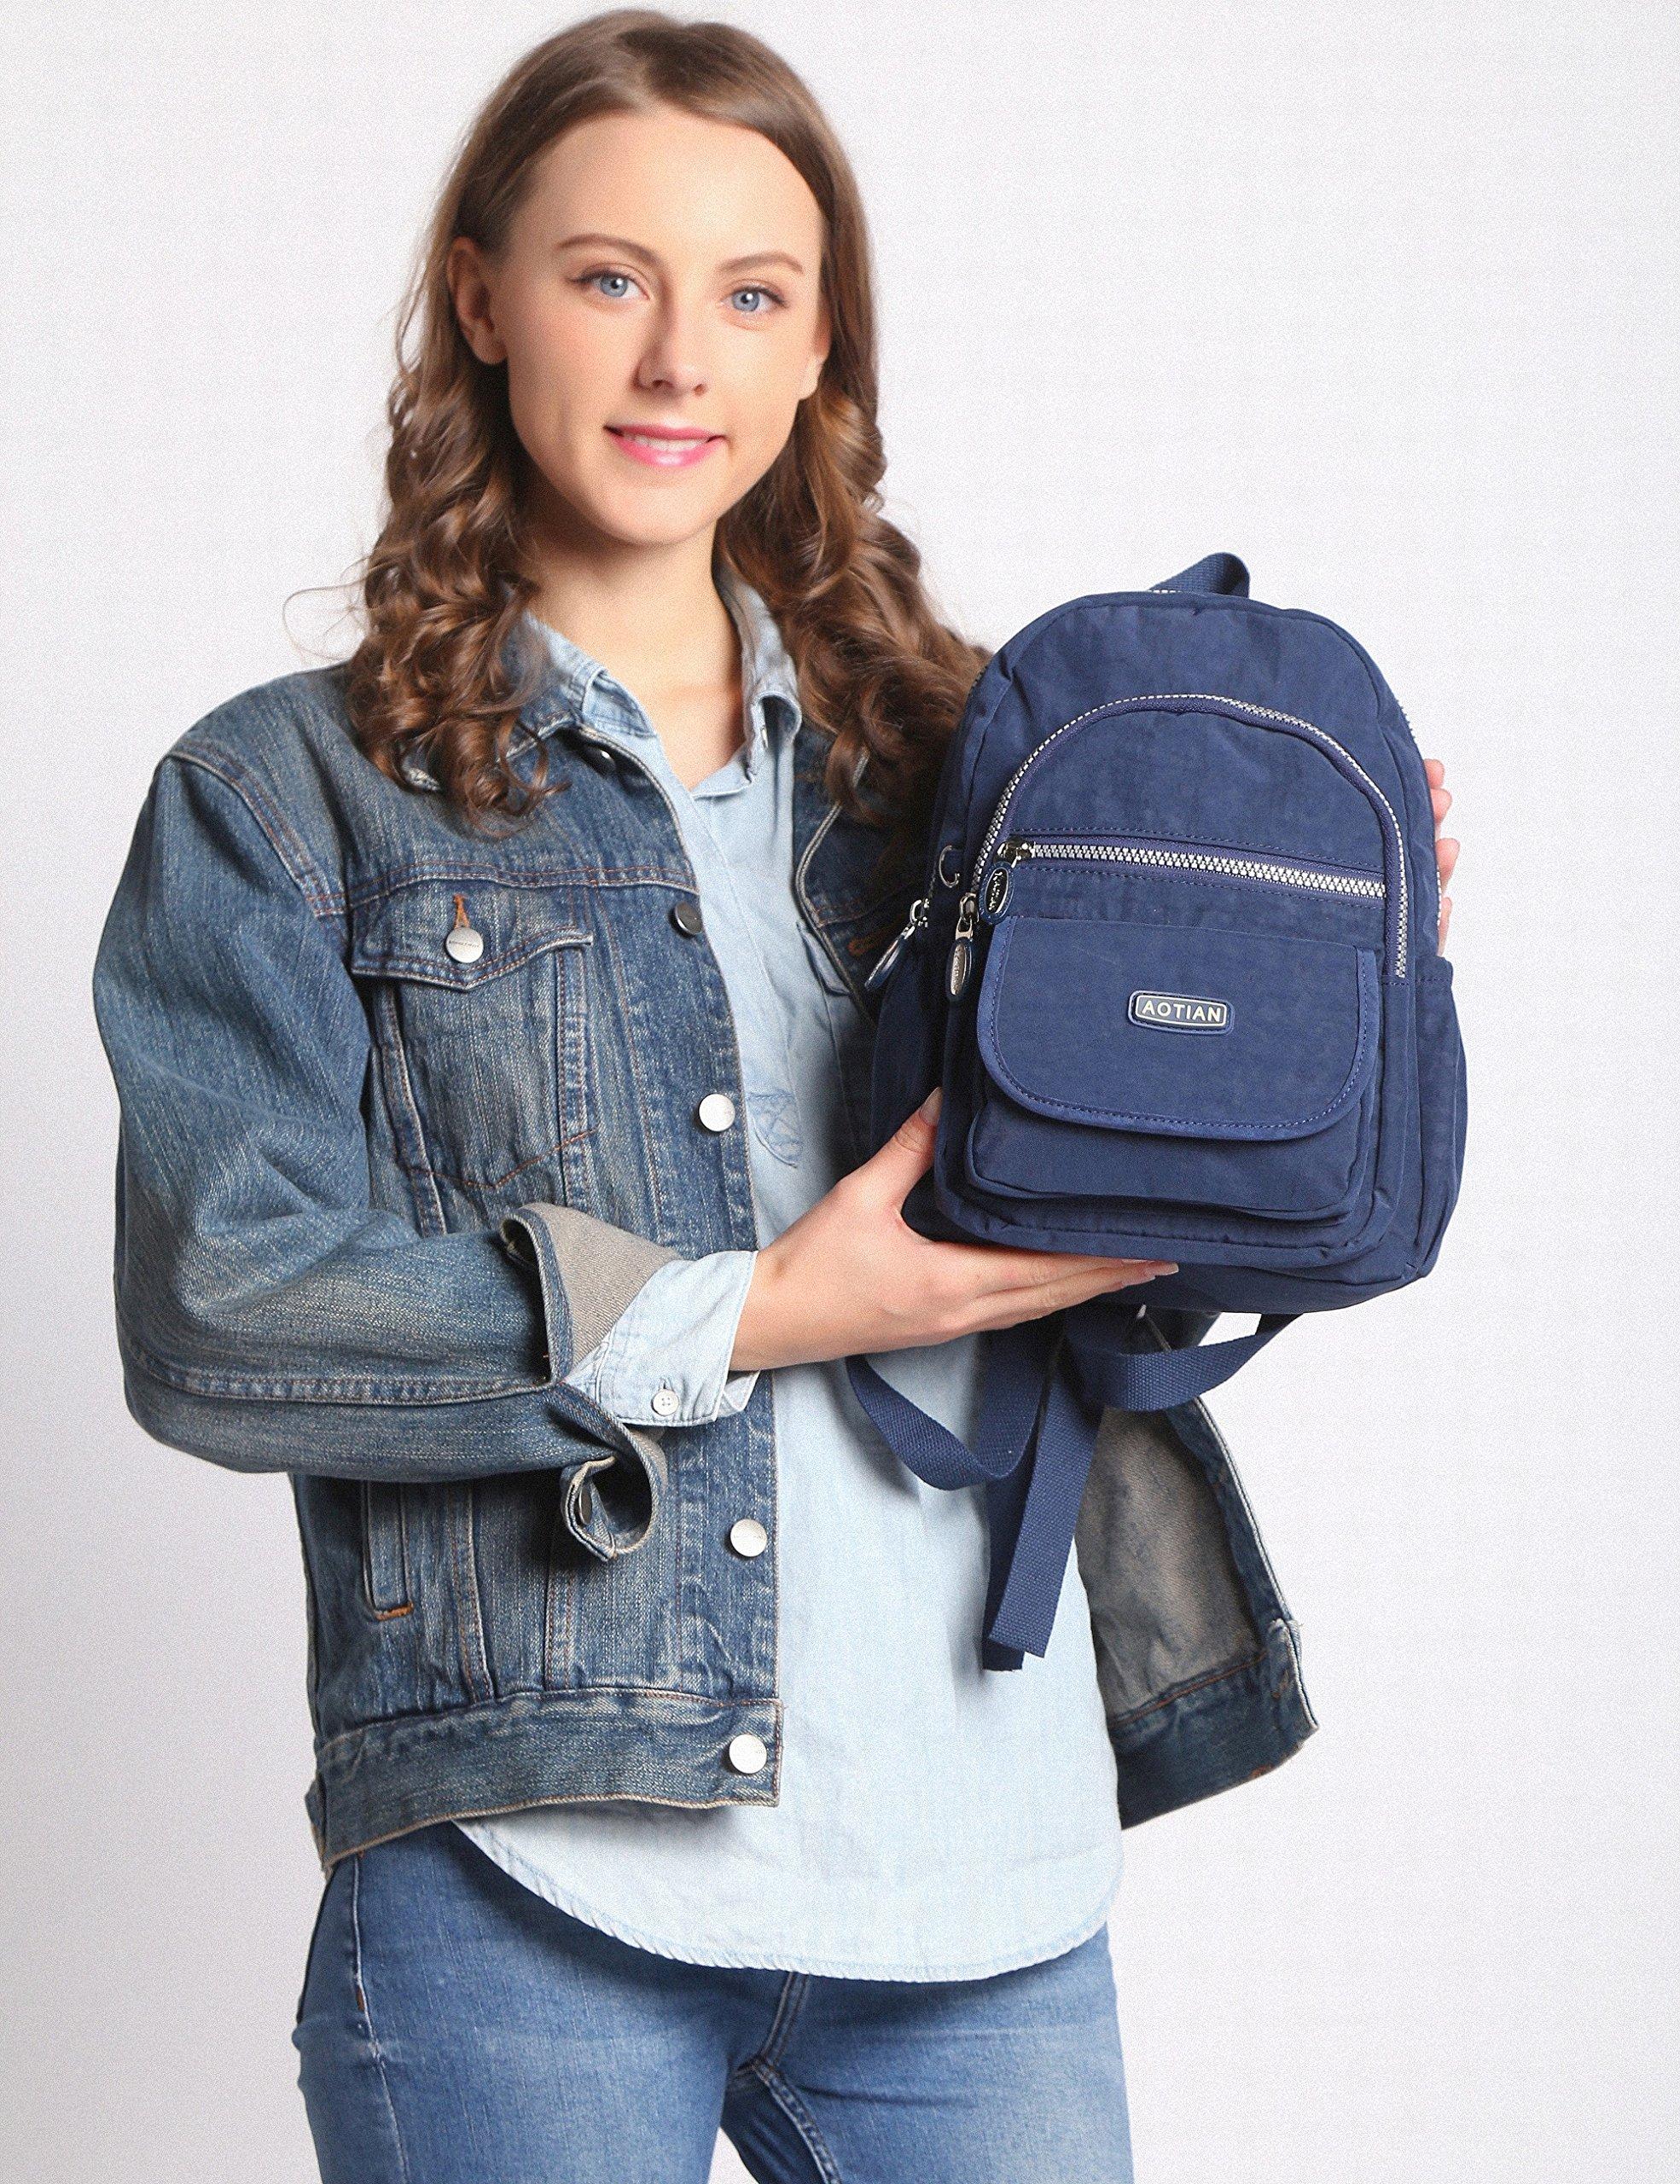 AOTIAN Mujer Peso Ligero Mochilas de Casual Juveniles Bolsas Escolares Bolsa de Uso Diario 9 litros Azul